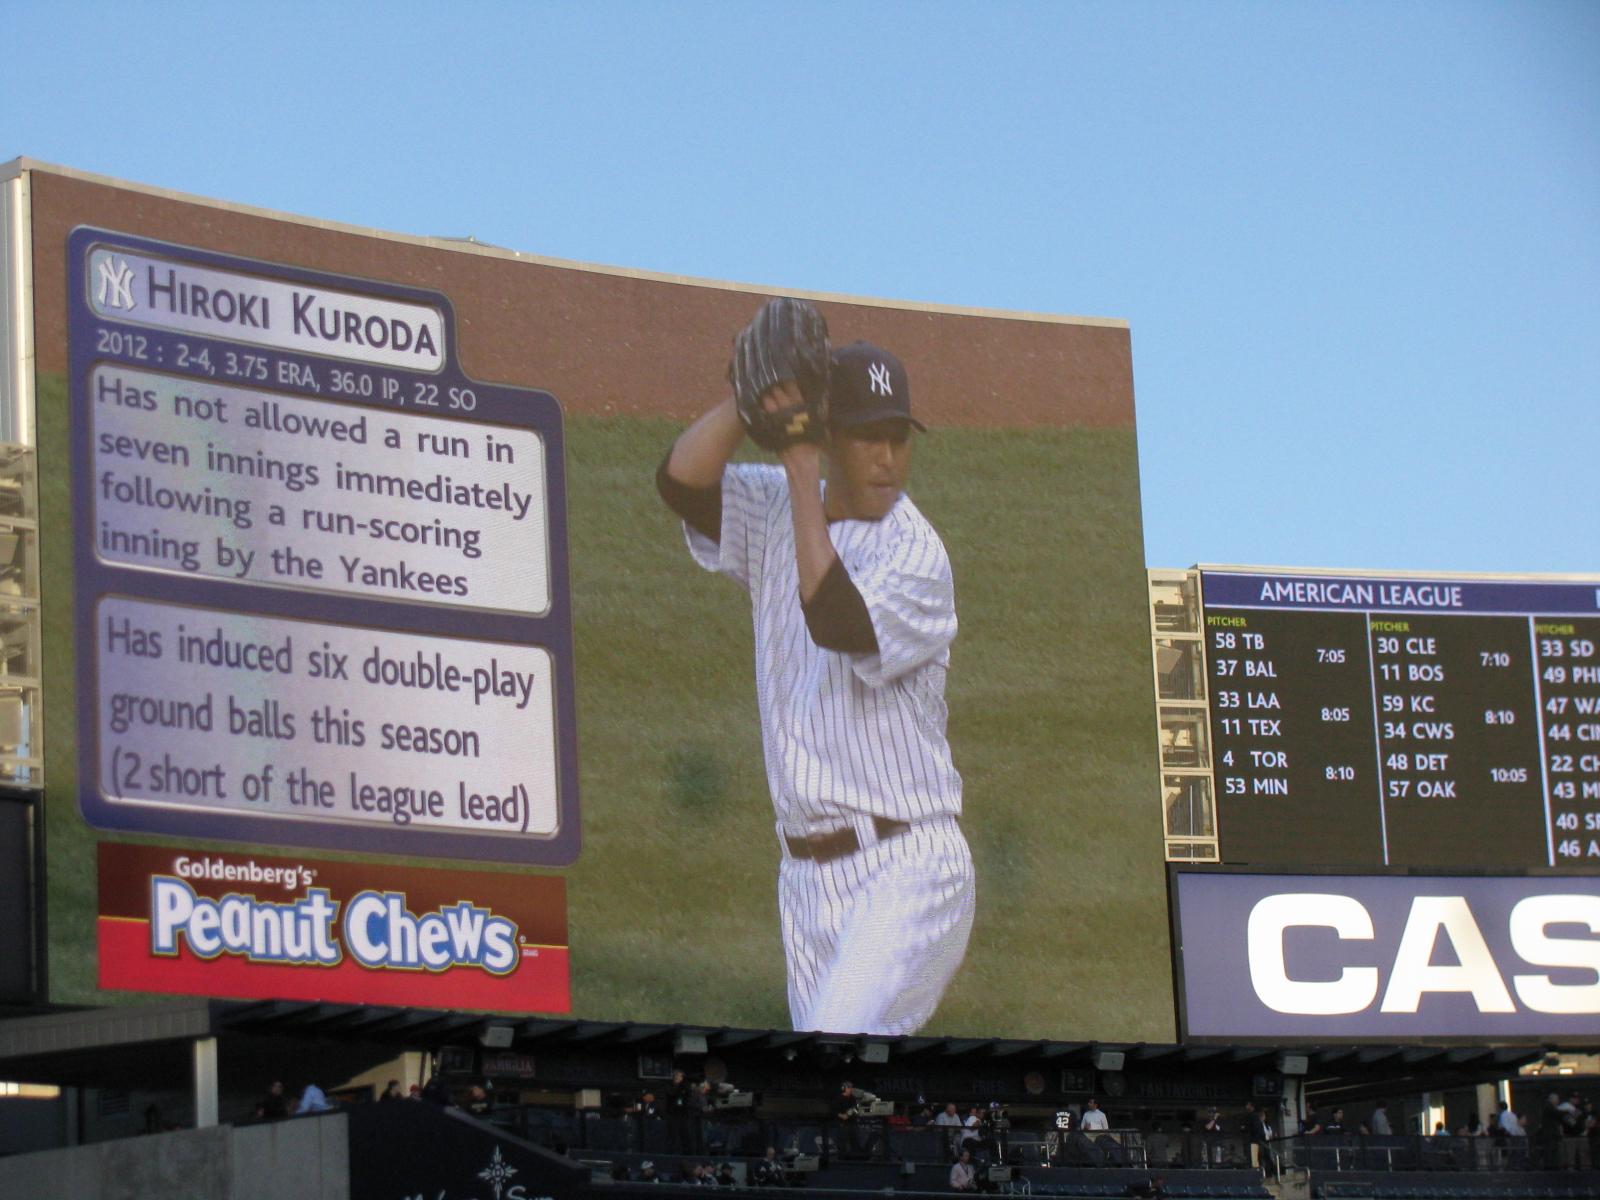 Photo: Yankees vs Mariners at Yankee Stadium (May 11)